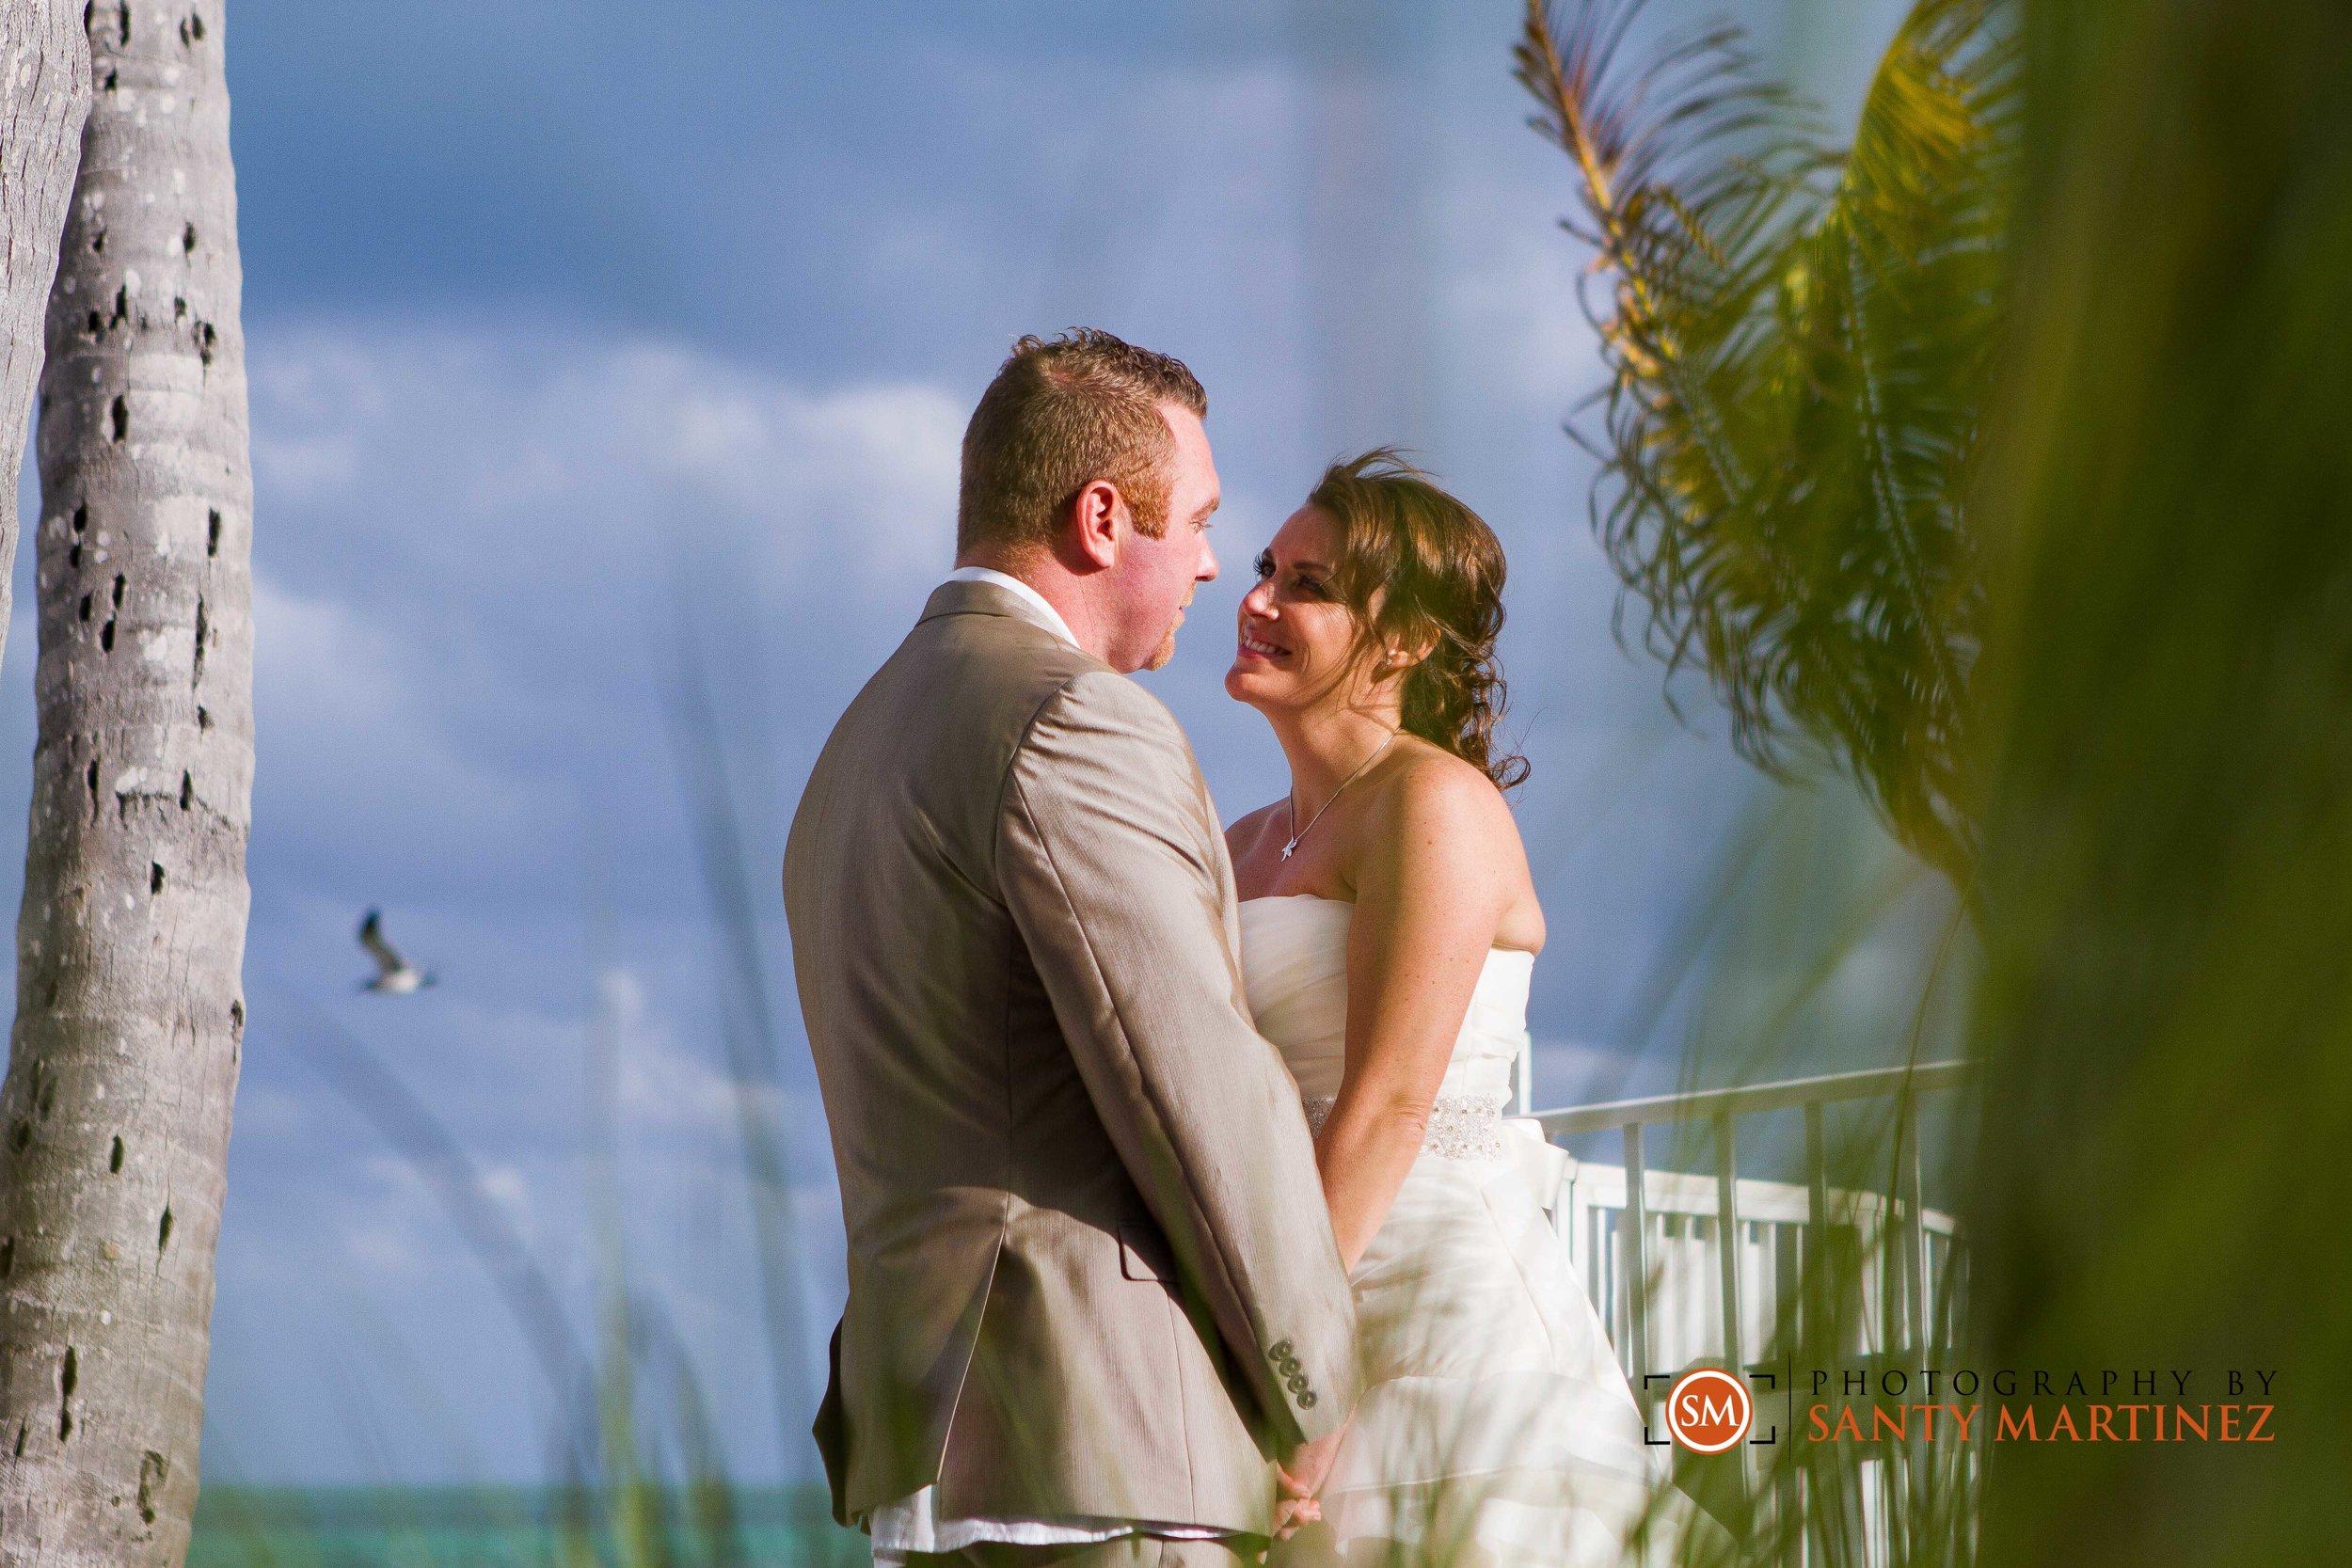 Photography by Santy Martinez - Miami Wedding Photographer-021.jpg